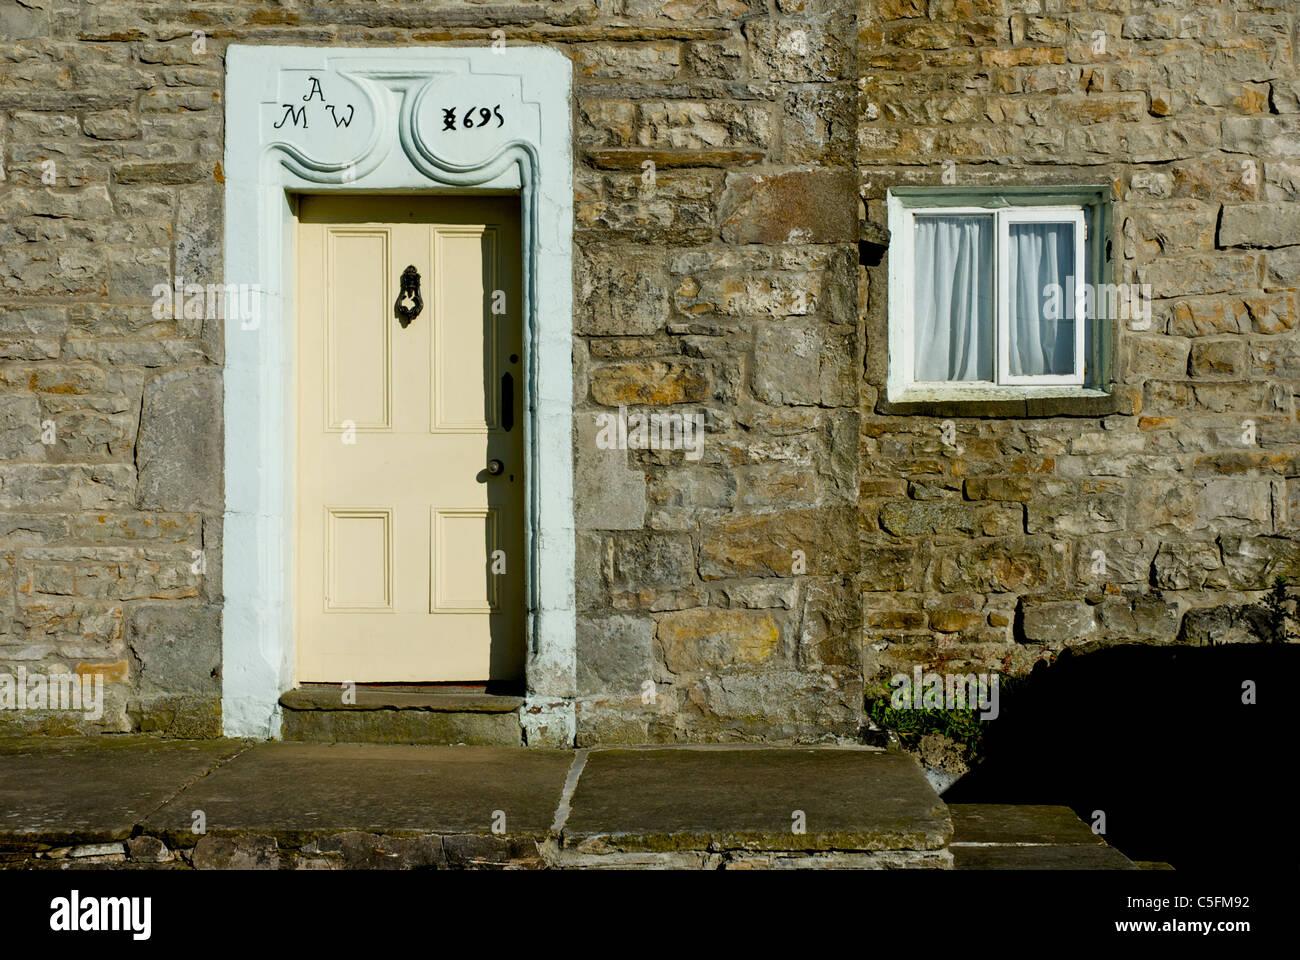 Door of house in village of Gayle, near Hawes, Wensleydale, Yorkshire Dales National Park, England UK - Stock Image